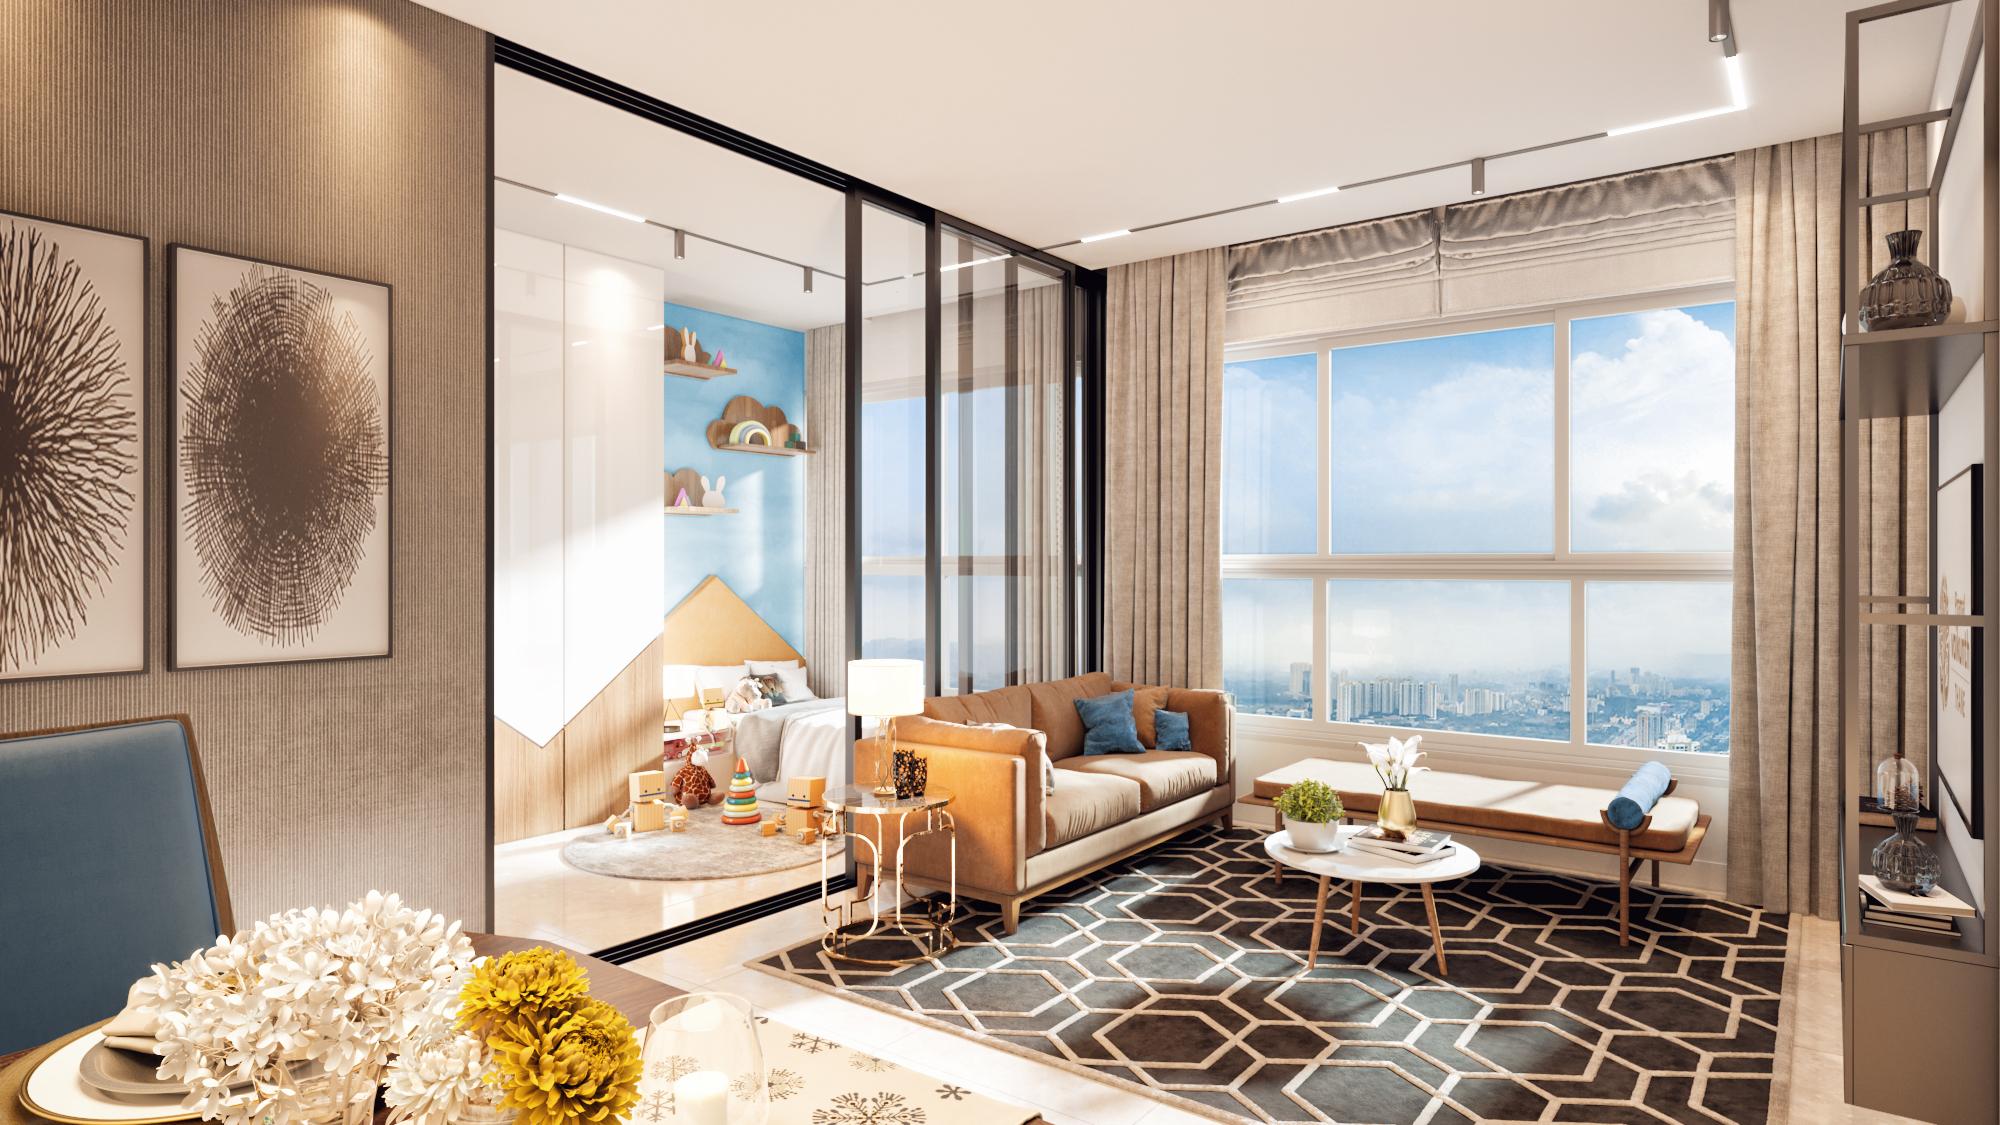 piramal vaikunth a class homes series 2 apartment interiors18